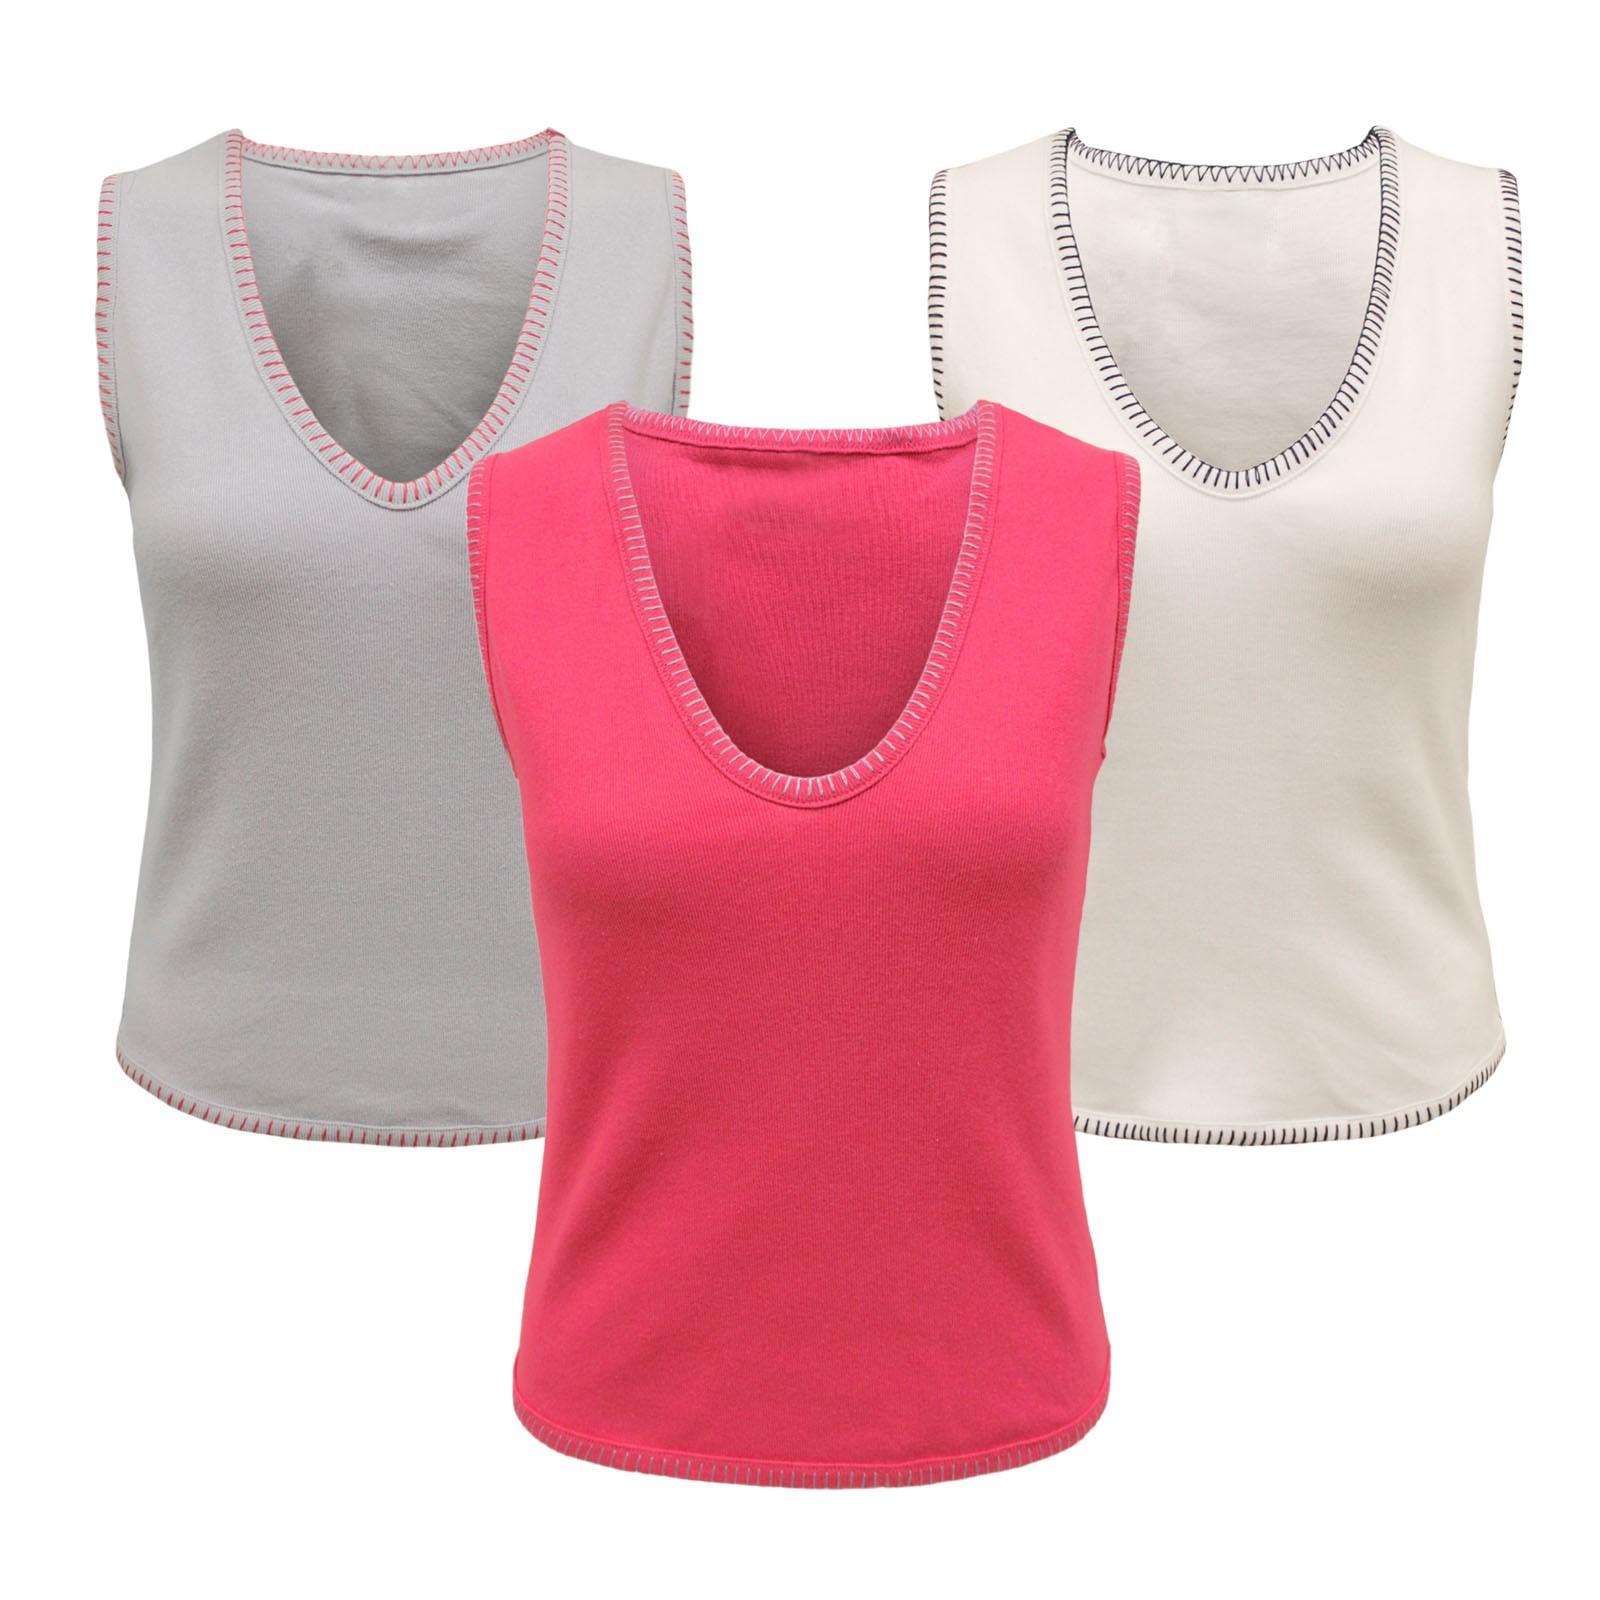 Wholesale Joblot of 18 Ladies V Neck Sleeveless Casual 100% Cotton Top